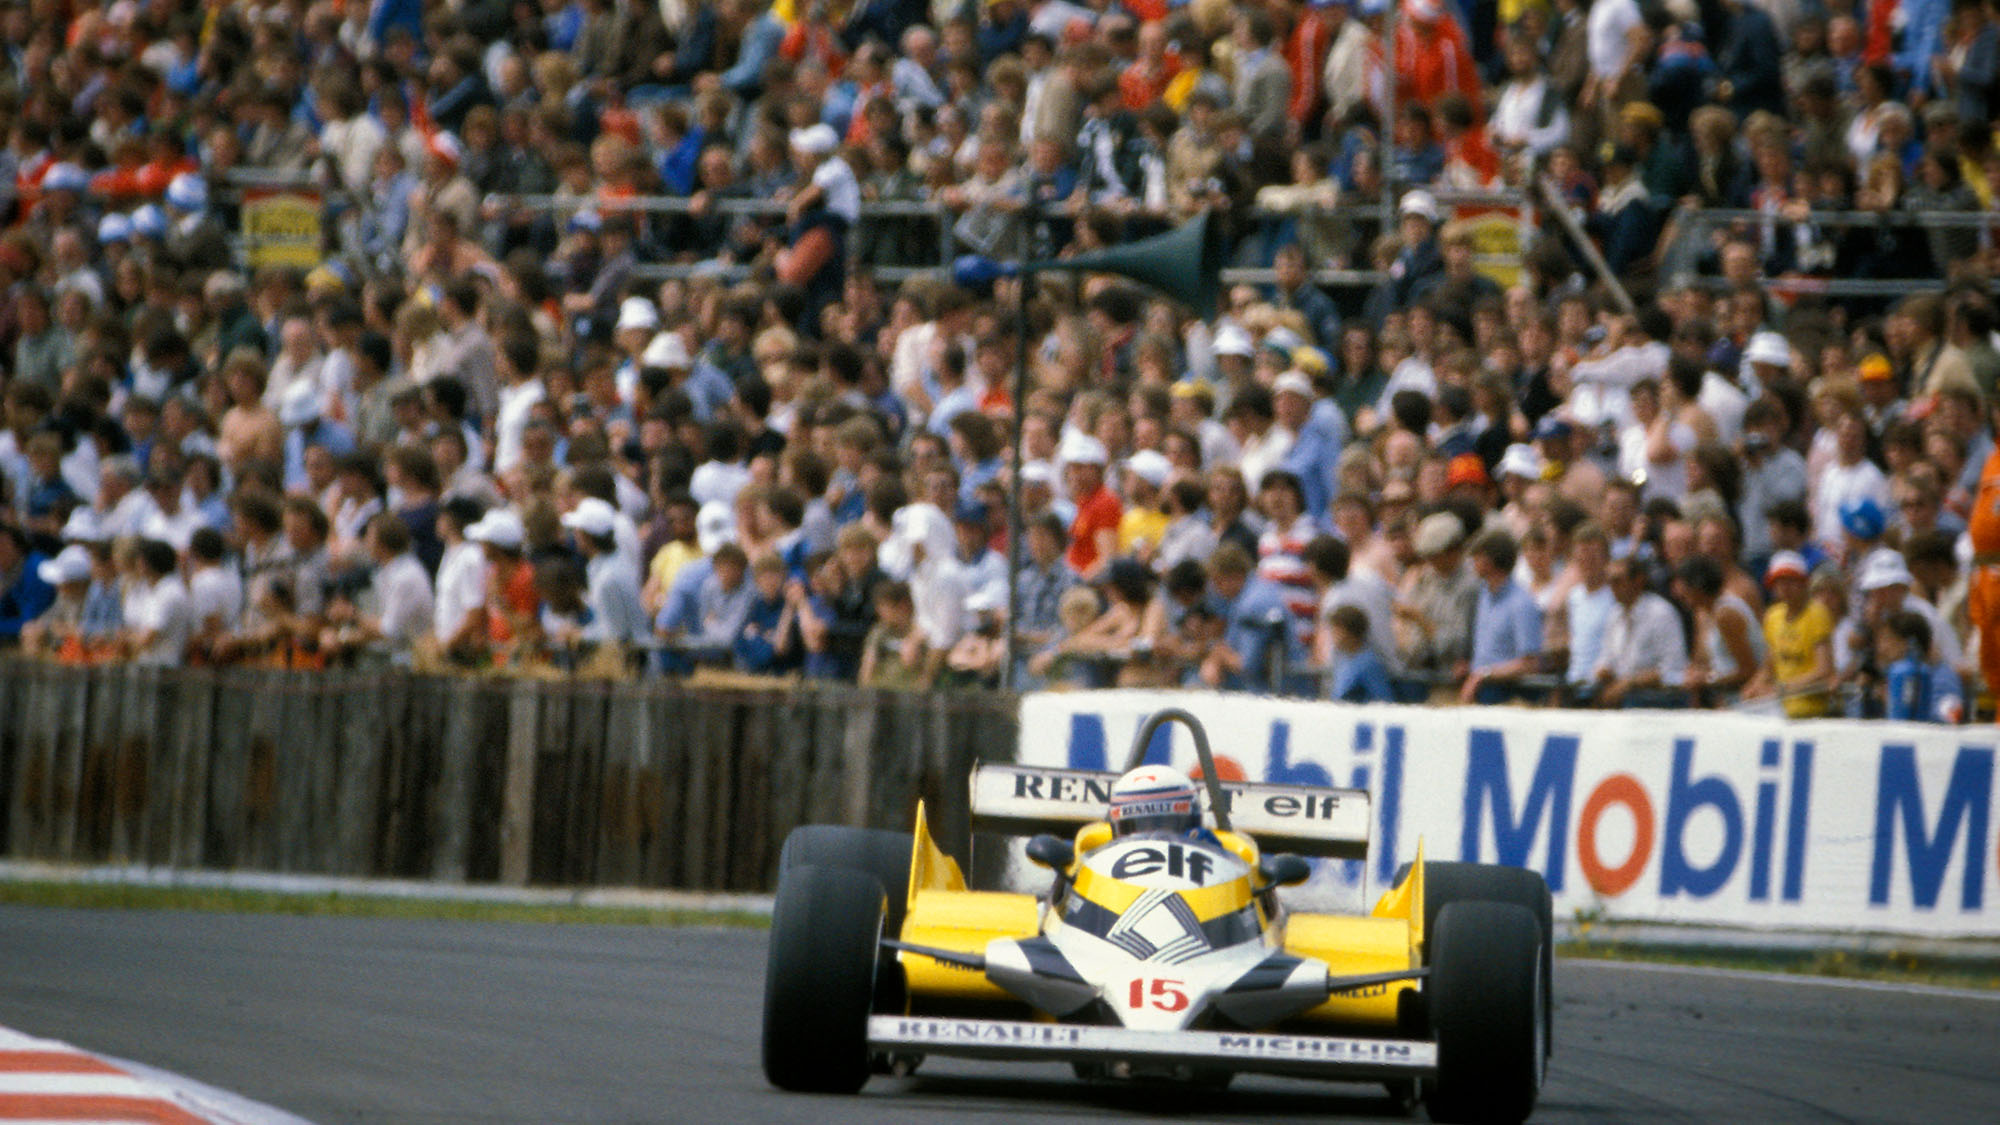 1981 British GP Alain Prost